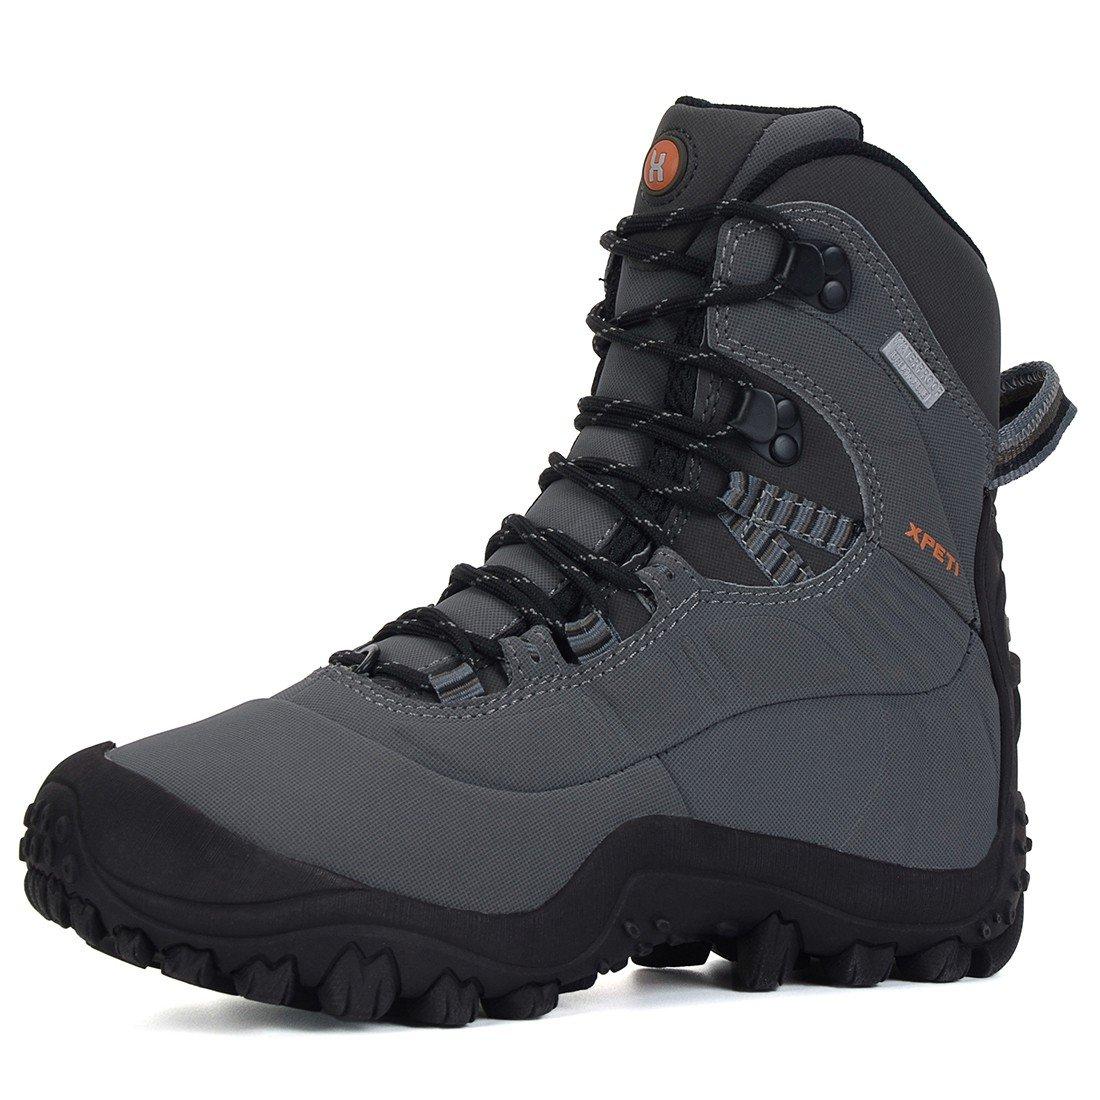 XPETI Women's Waterproof Mid High-Top Hiking Outdoor Boot B07F8KGZG3 9.5 B(M) US|Light Grey